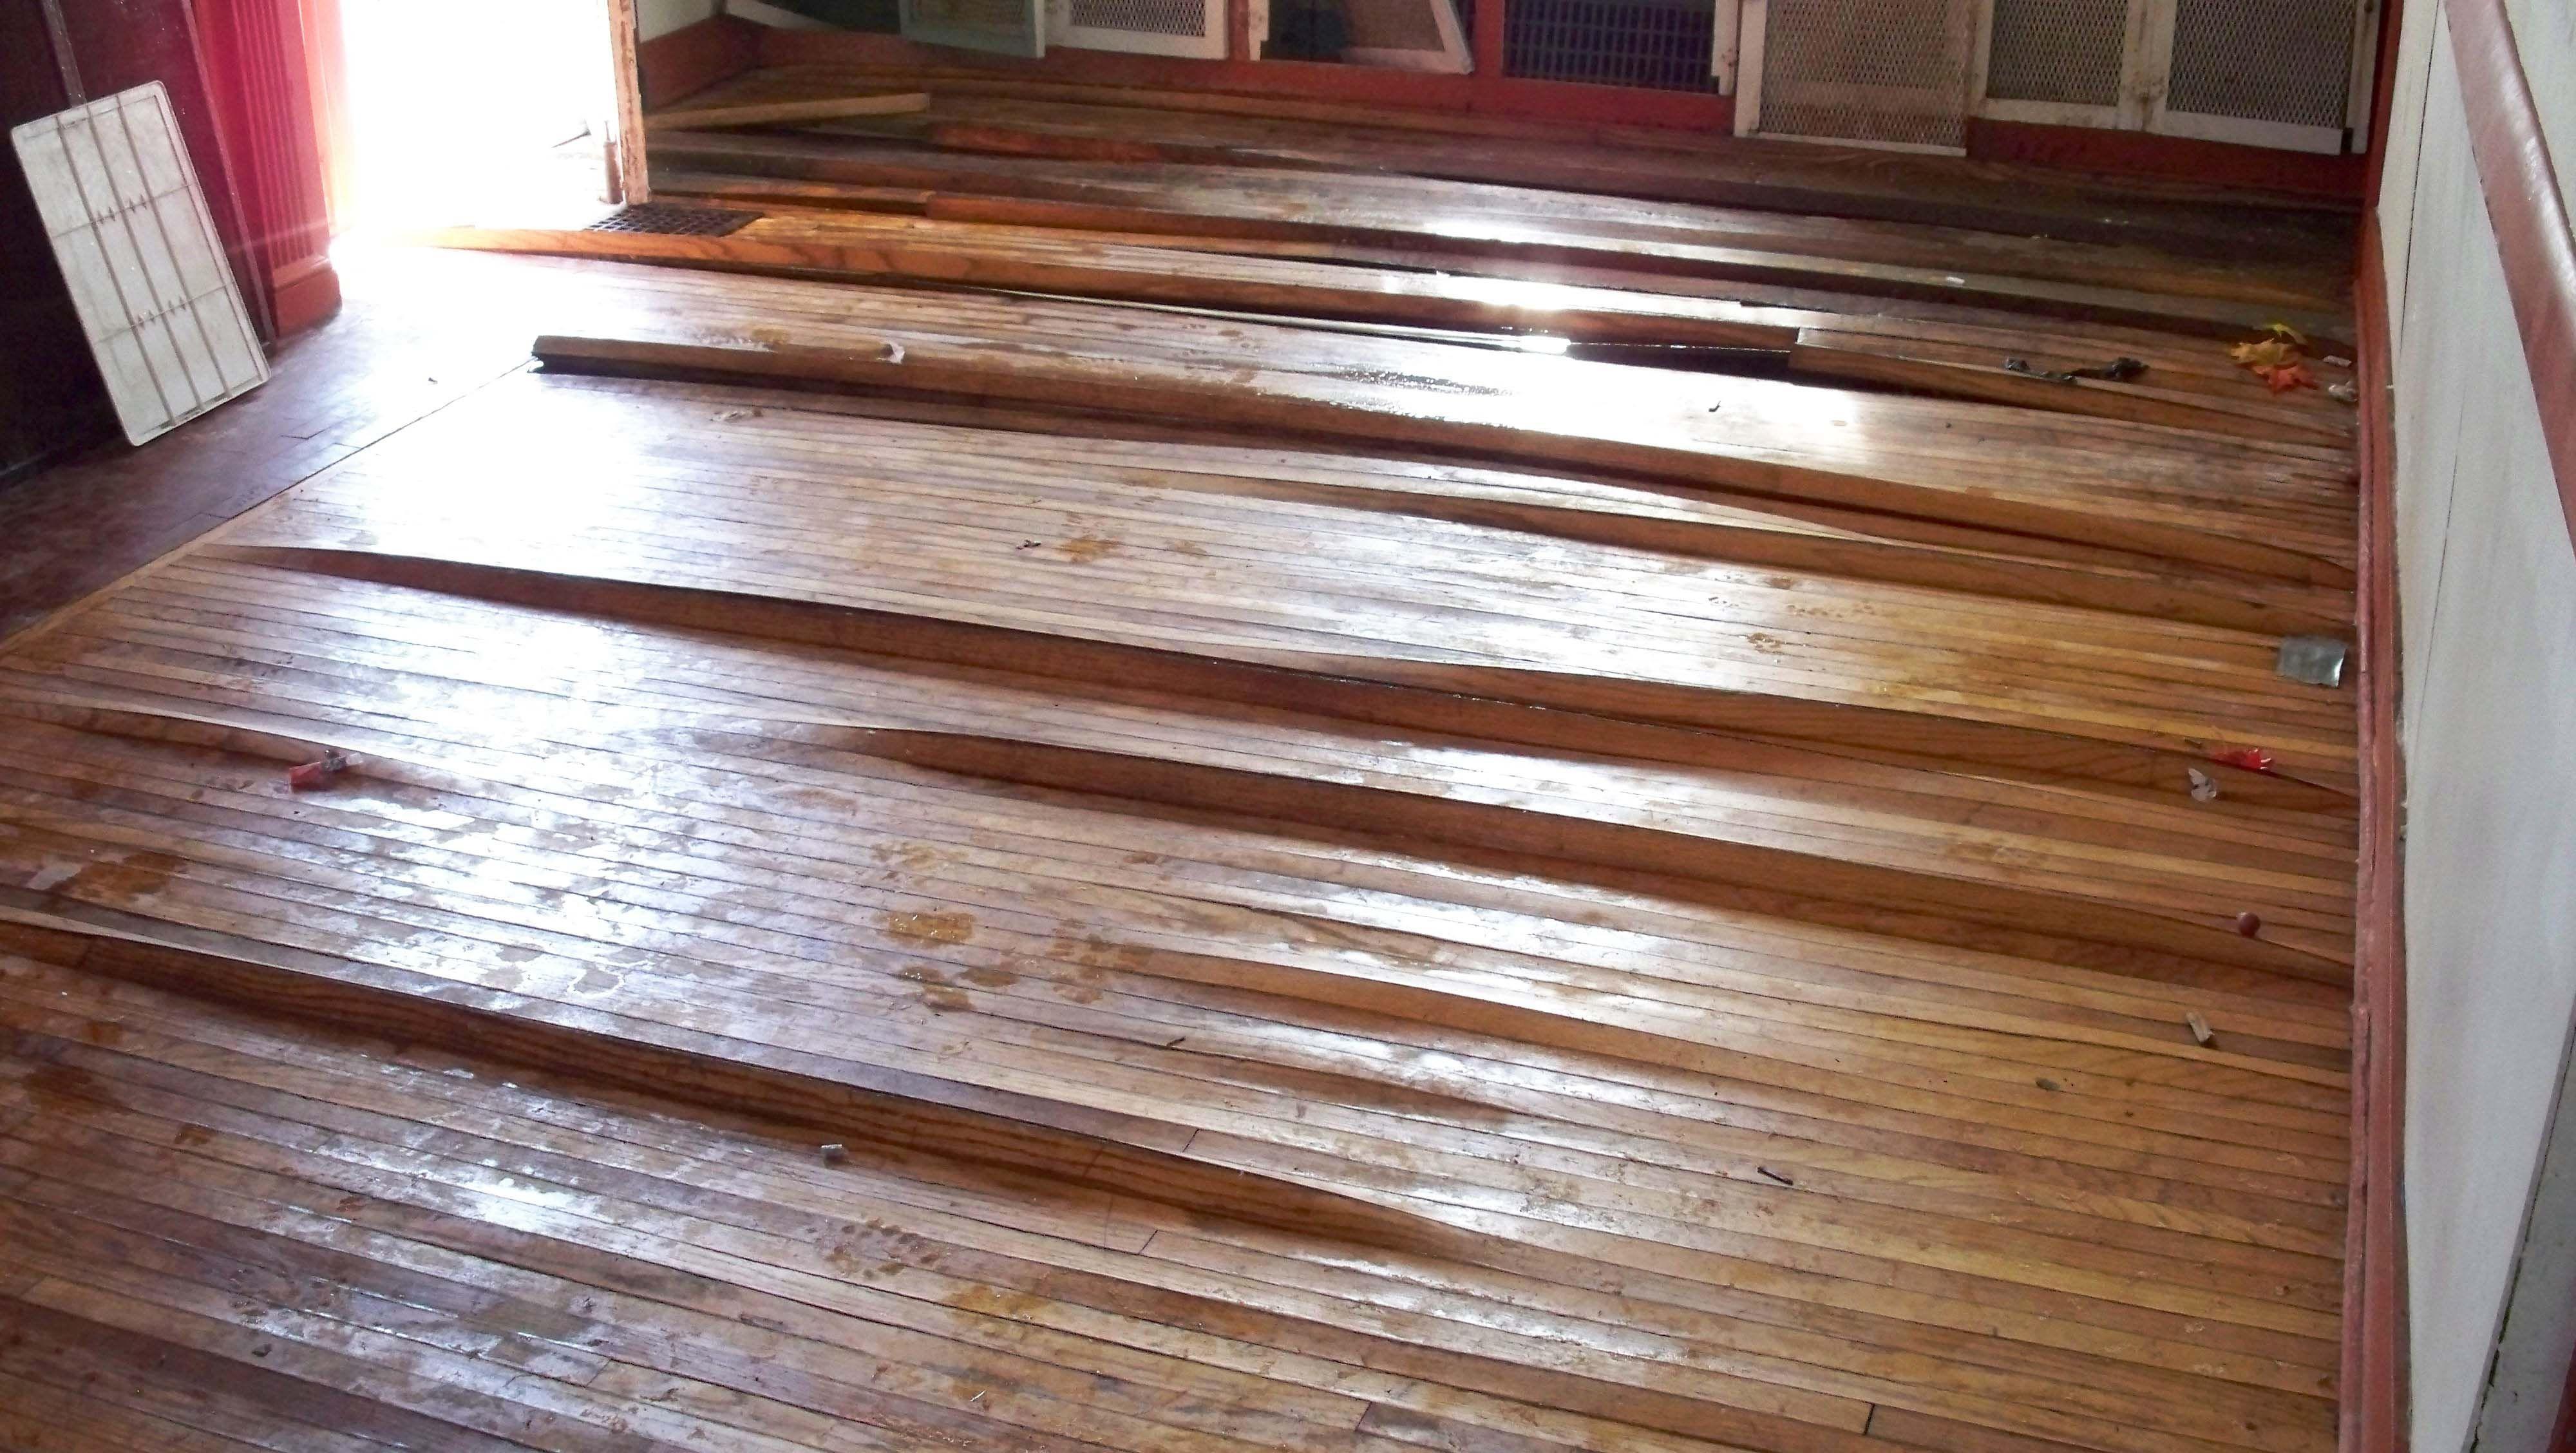 hardwood floor adhesive of hardwood floor water damage warping hardwood floors pinterest in hardwood floor water damage warping